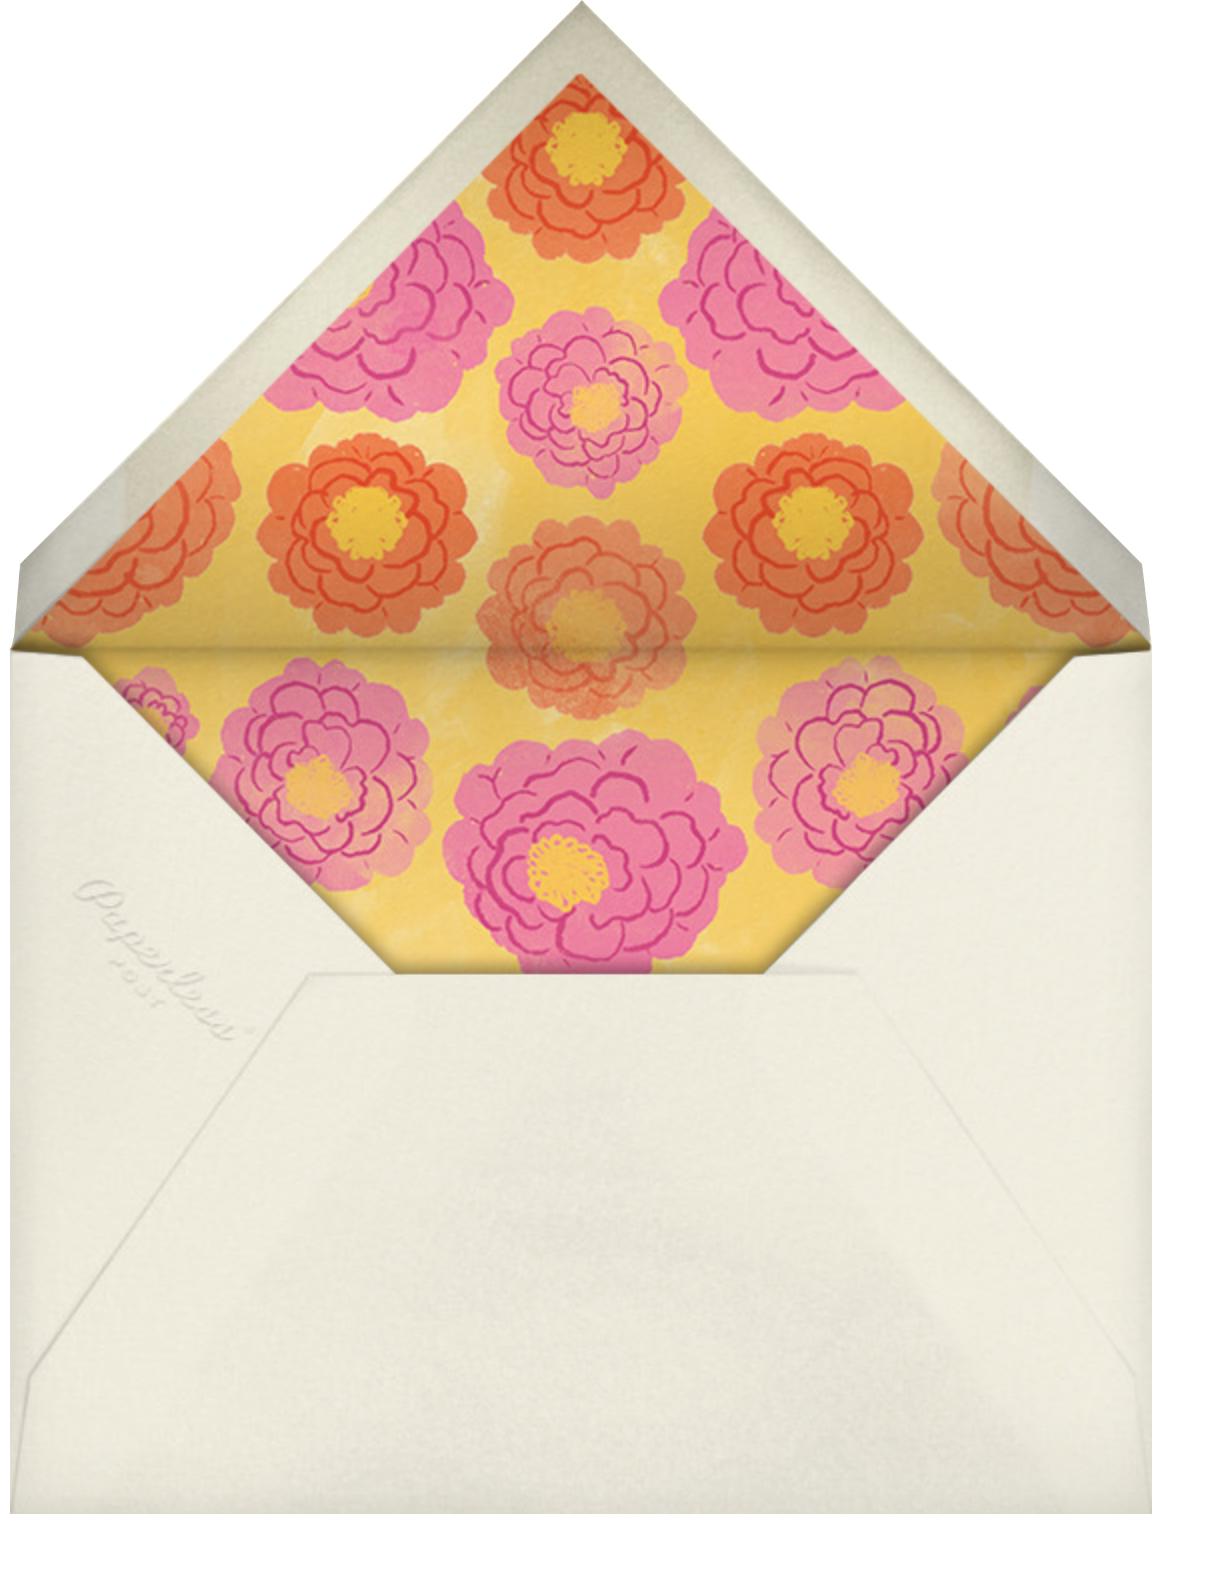 Vase of Marigolds - Paperless Post - Envelope